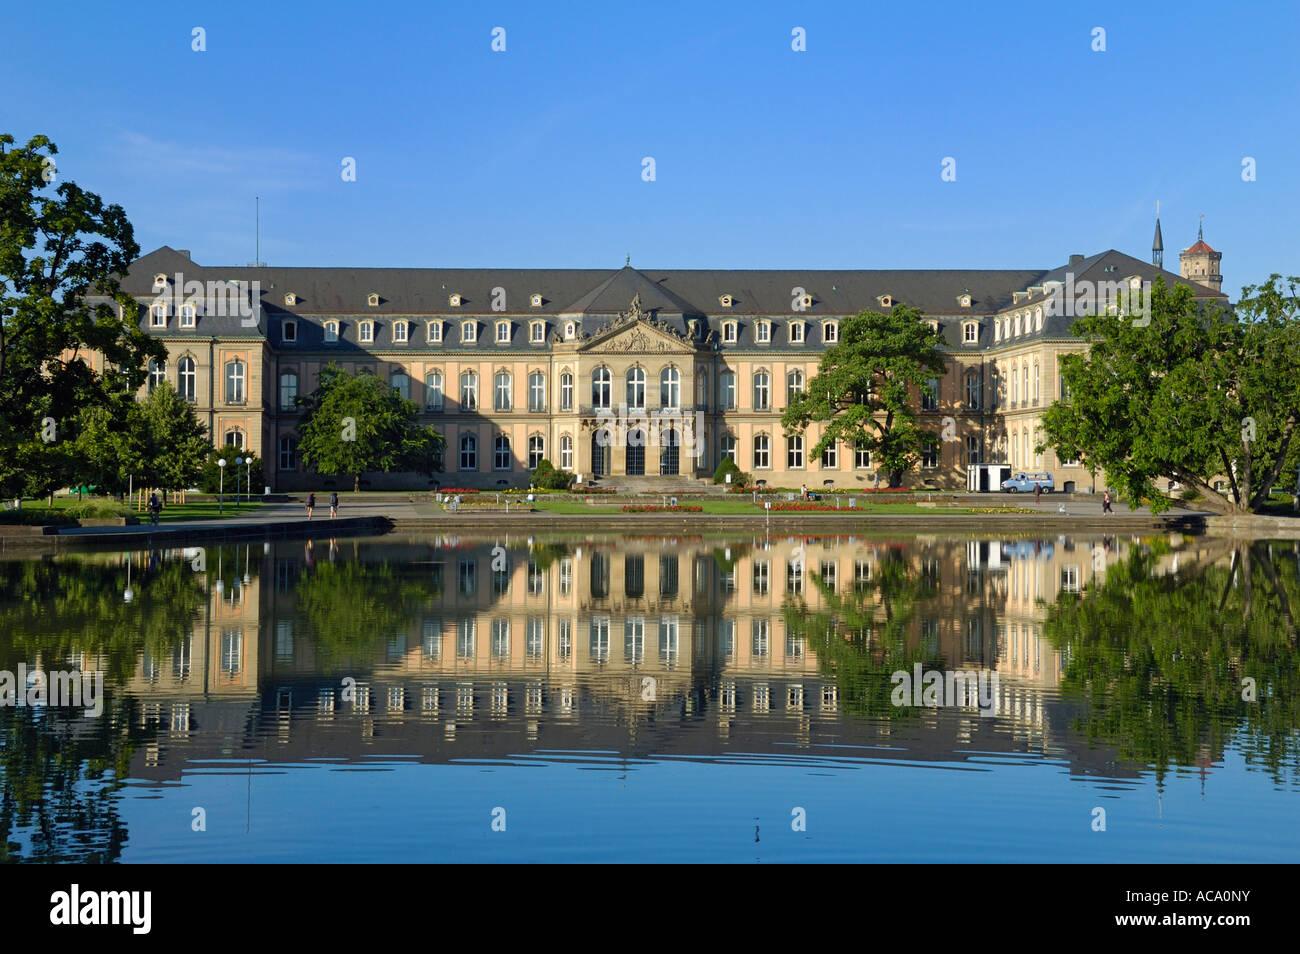 New Palace (Neues Schloss), Stuttgart, Baden-Wuerttemberg, Germany, Europe Stock Photo